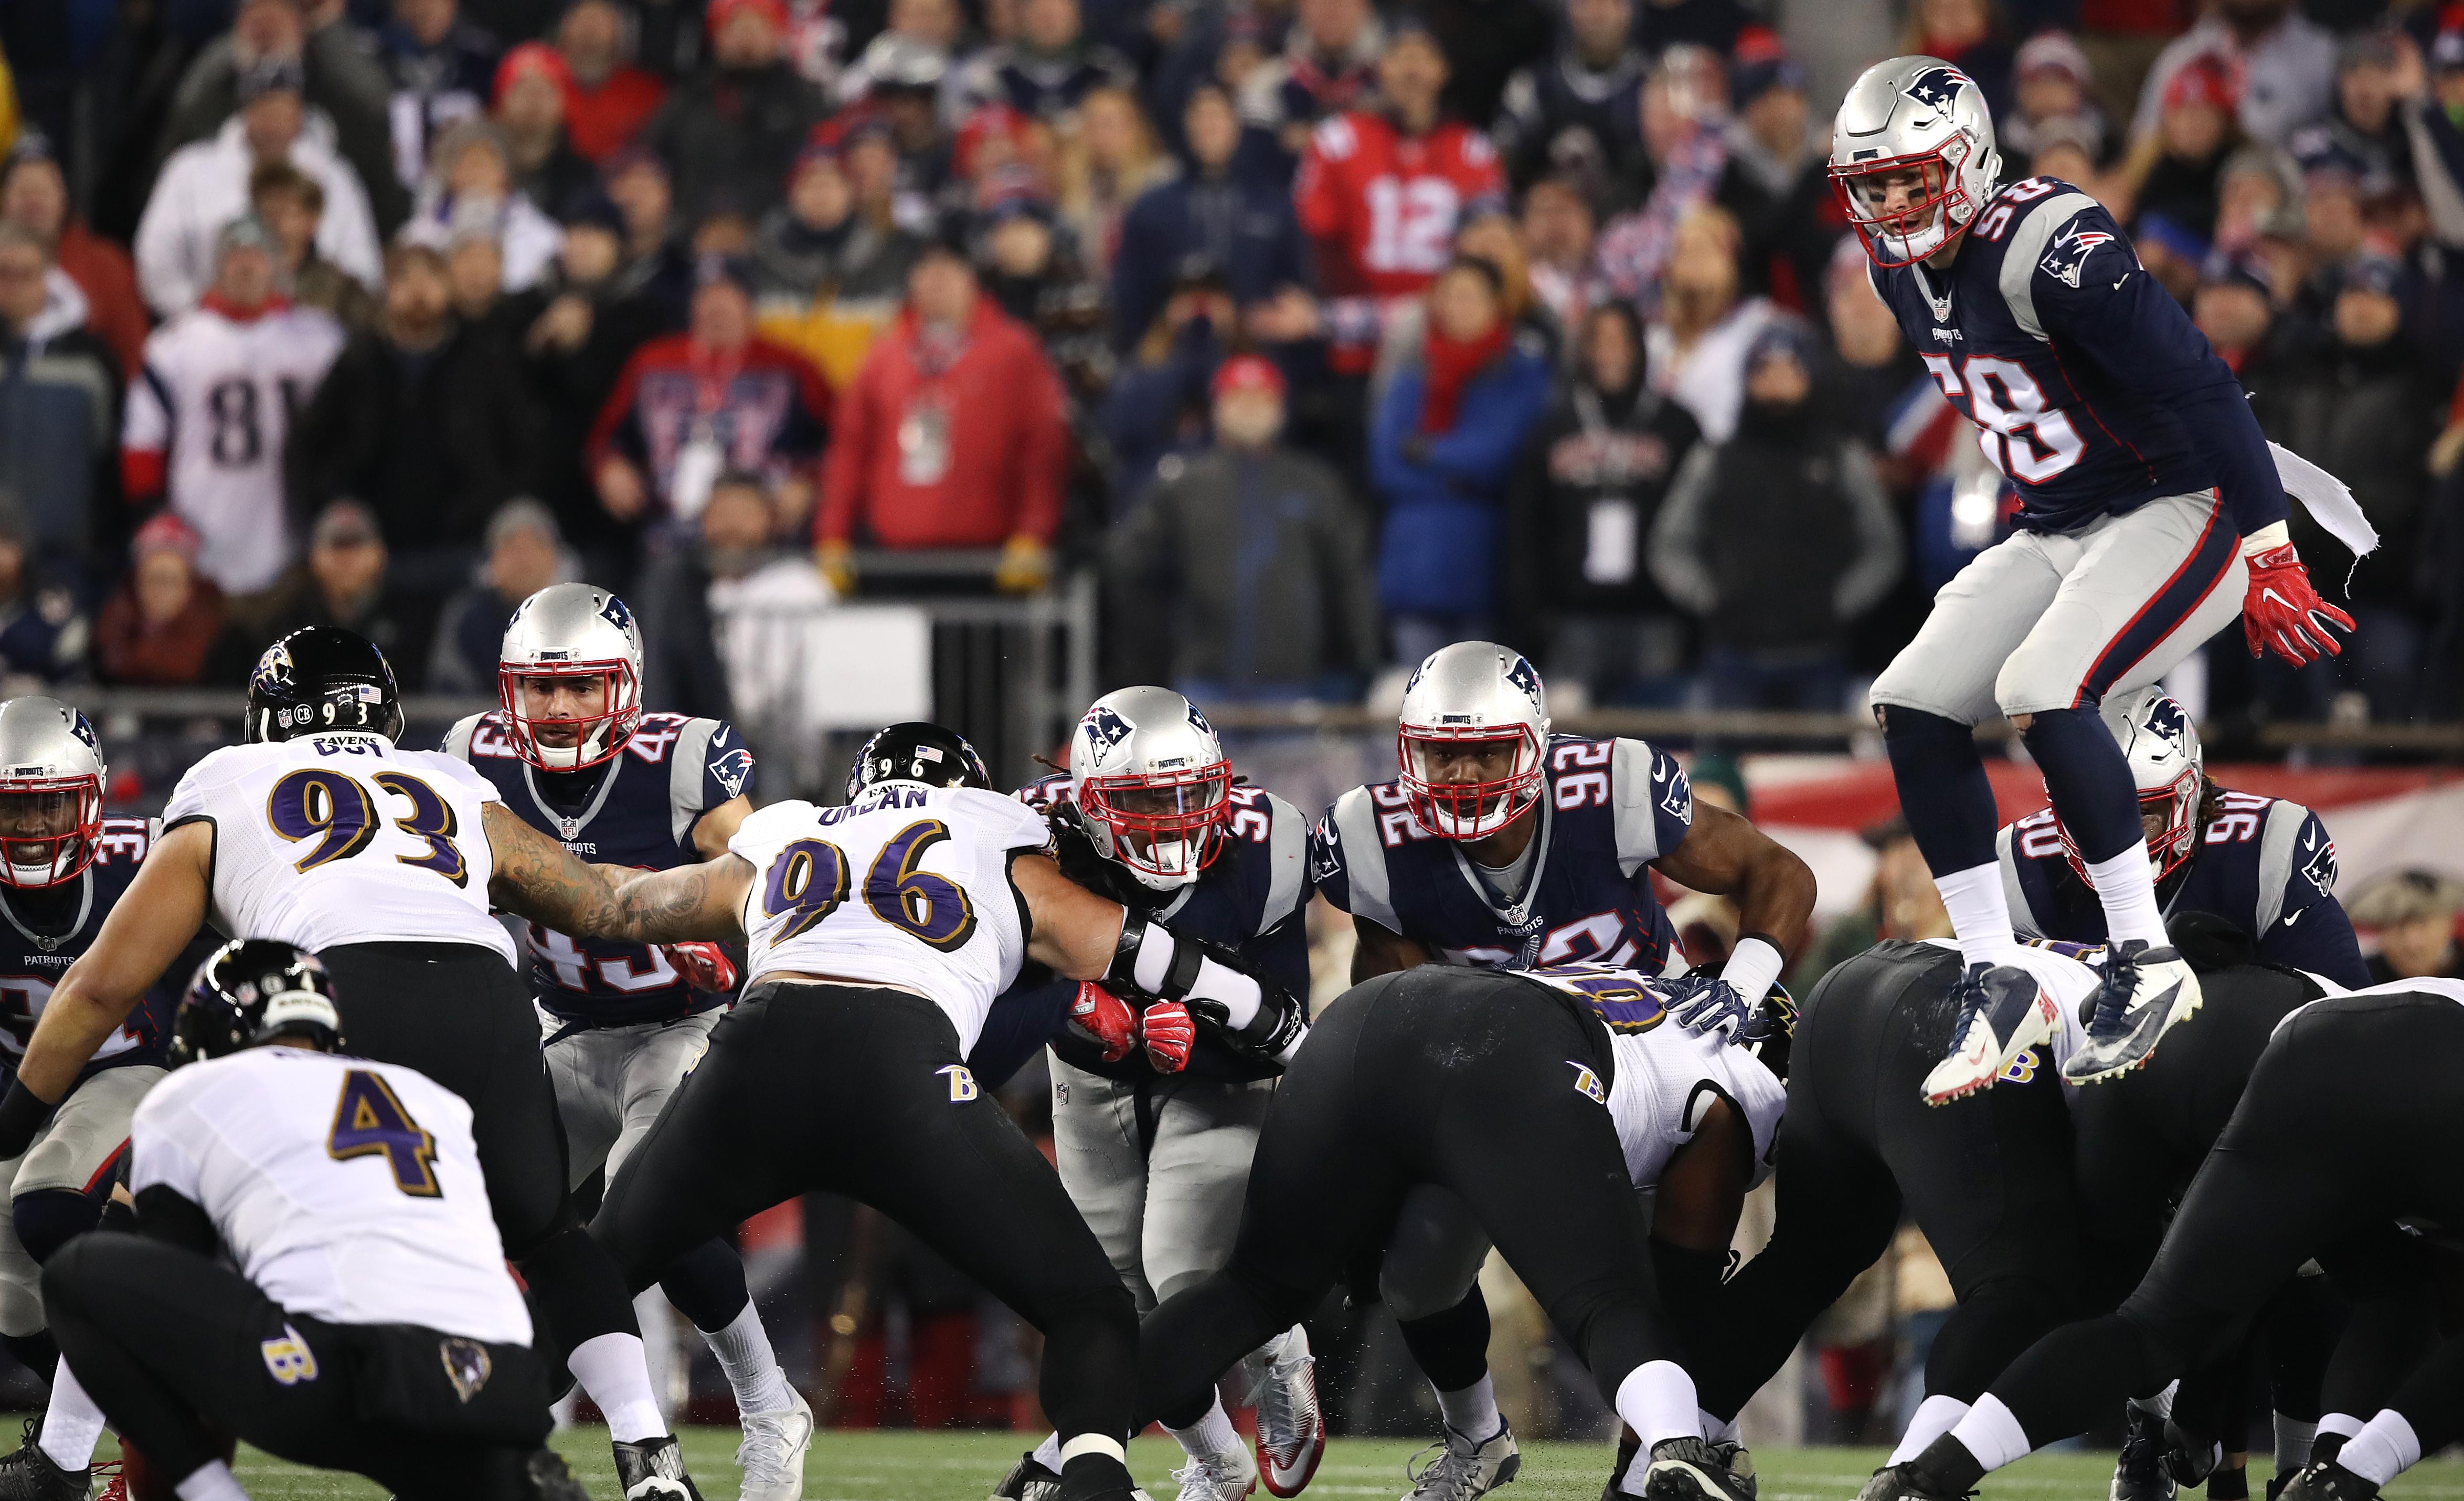 Patriots release linebacker Shea McClellin - The Boston Globe